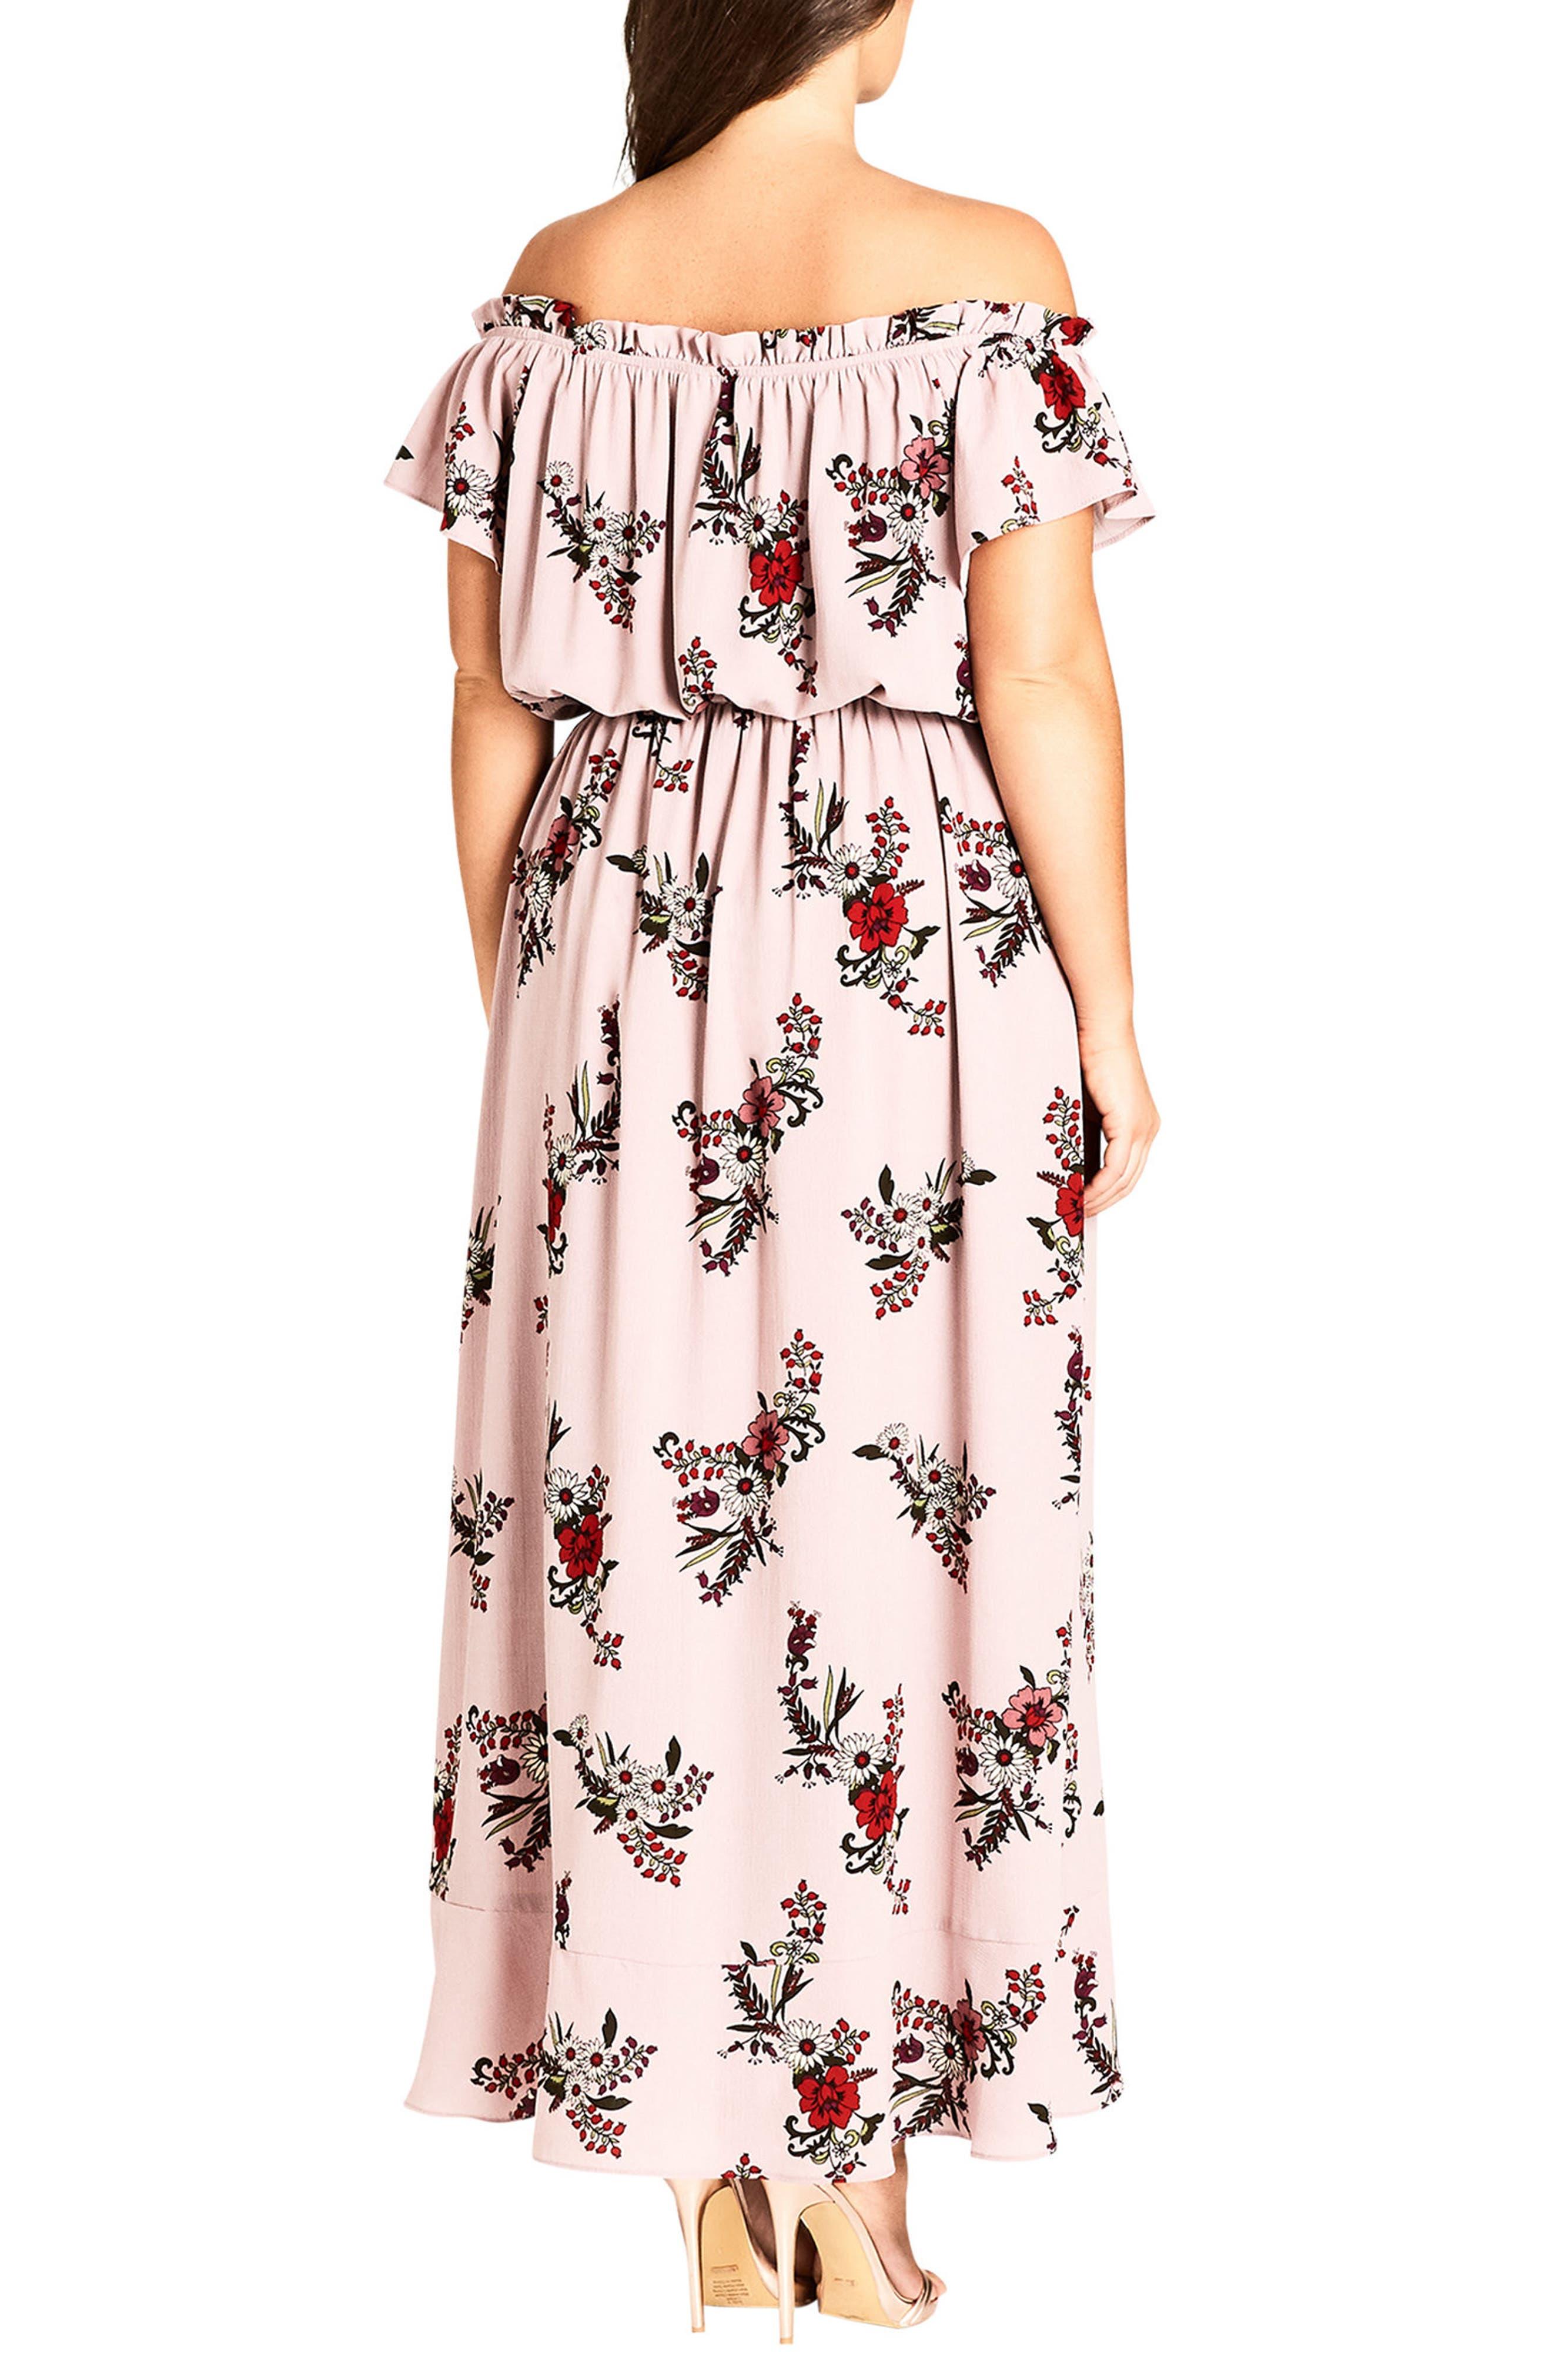 Sky Floral Off the Shoulder Maxi Dress,                             Alternate thumbnail 2, color,                             512